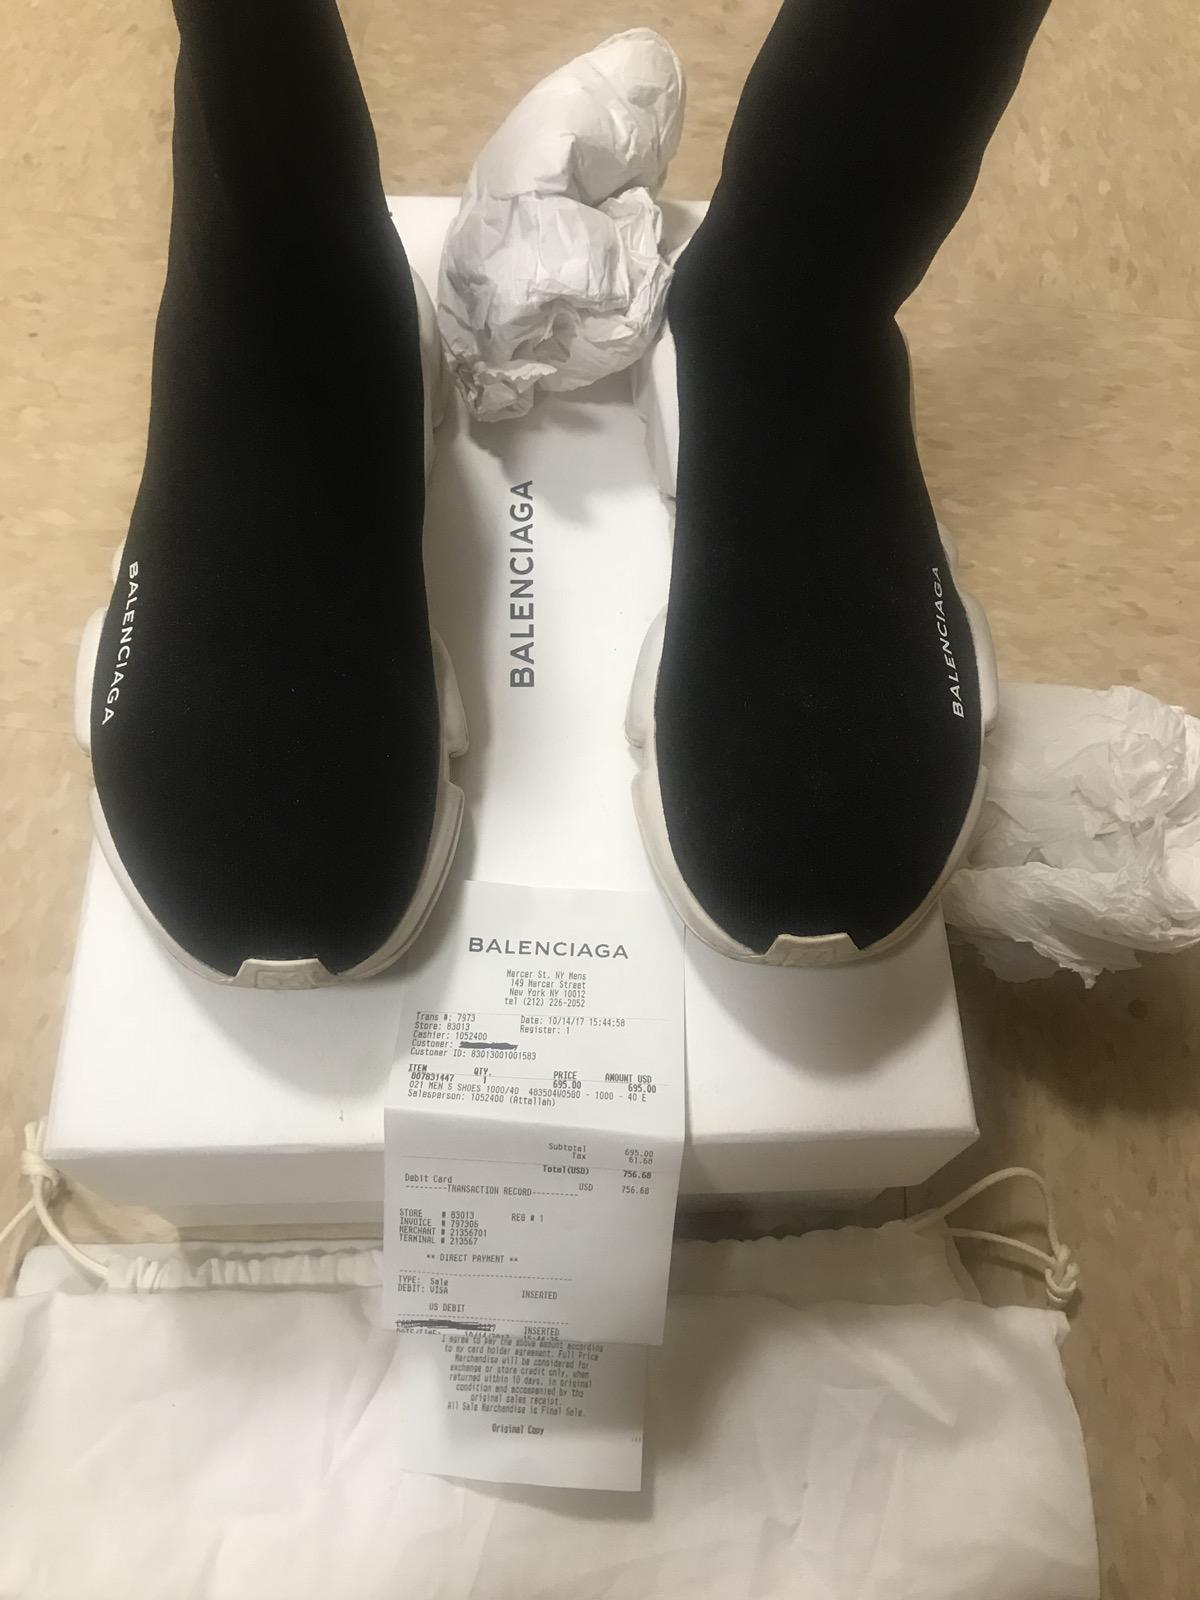 d065ef7994086 Balenciaga Balenciaga Speed Trainer Size 8 - Boots for Sale - Grailed